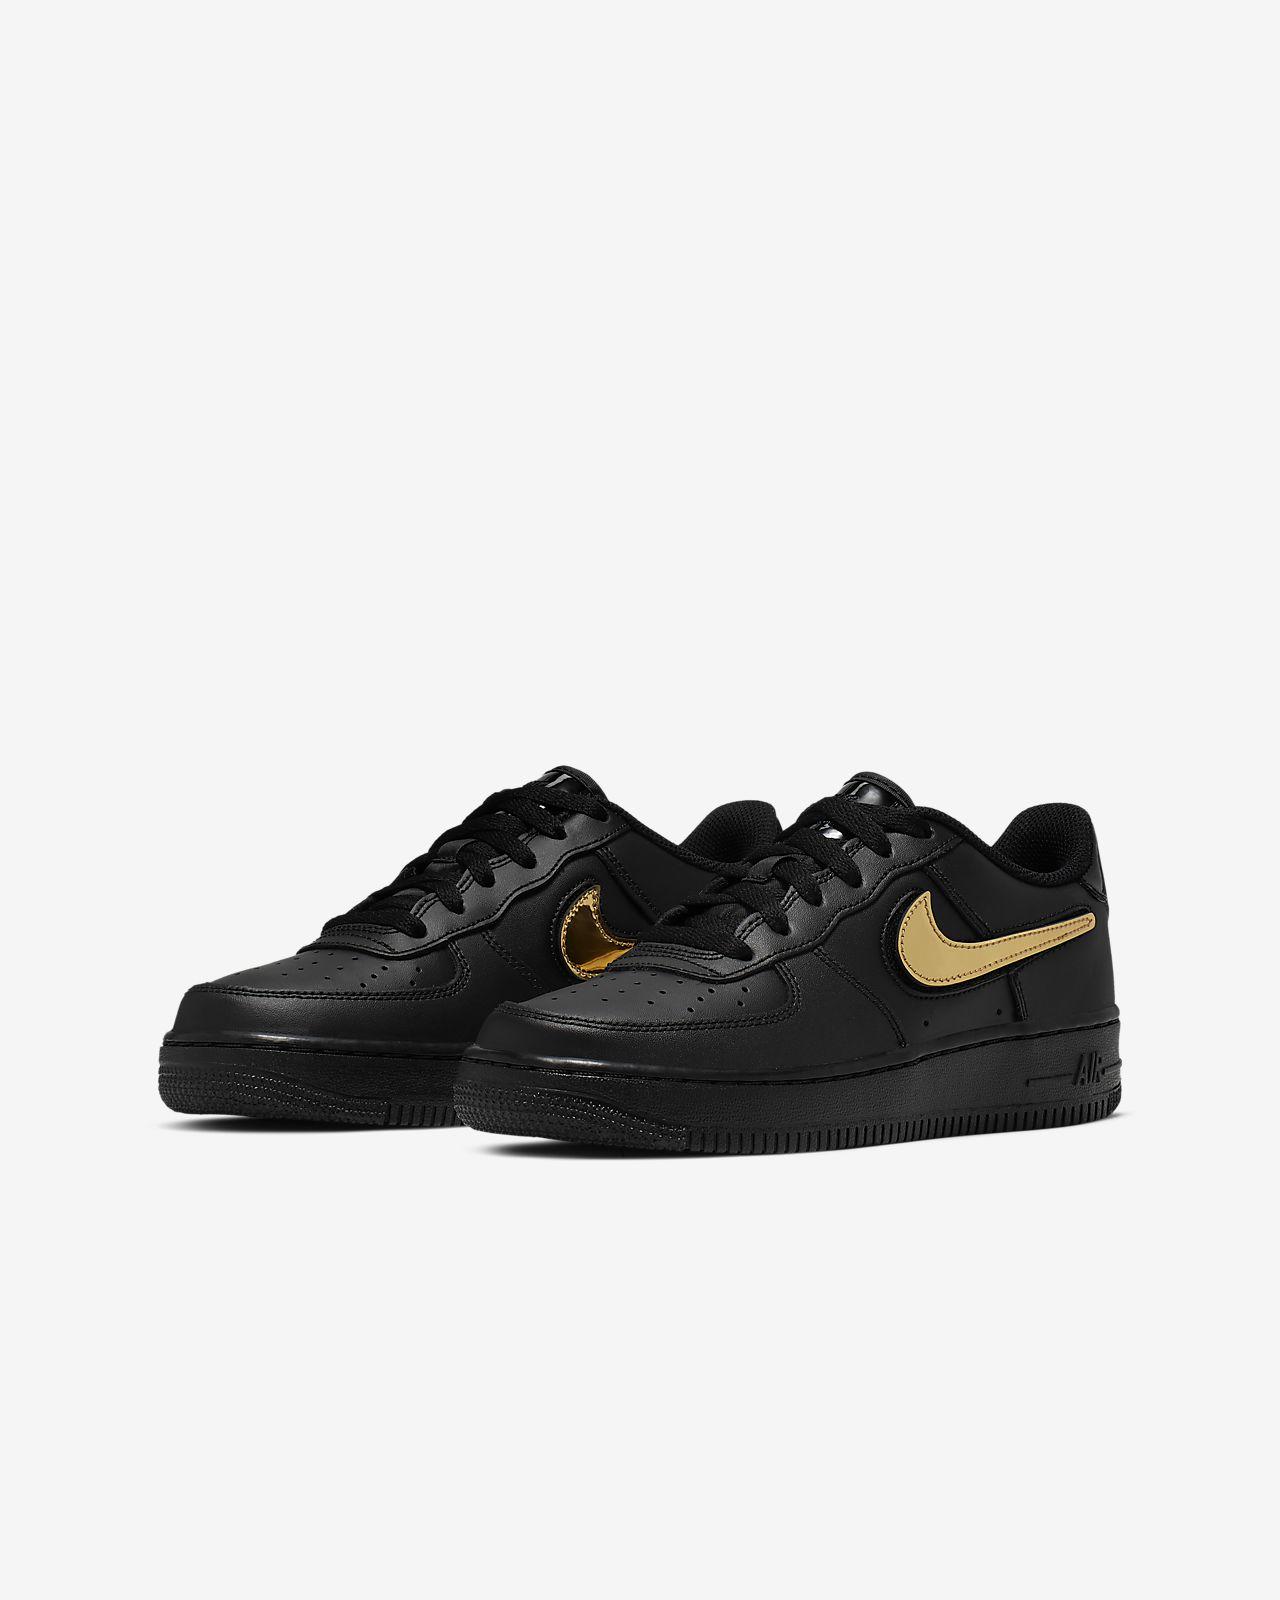 Bestellen Rabatt Nike Air Force 1 Damen Schuhe Mit